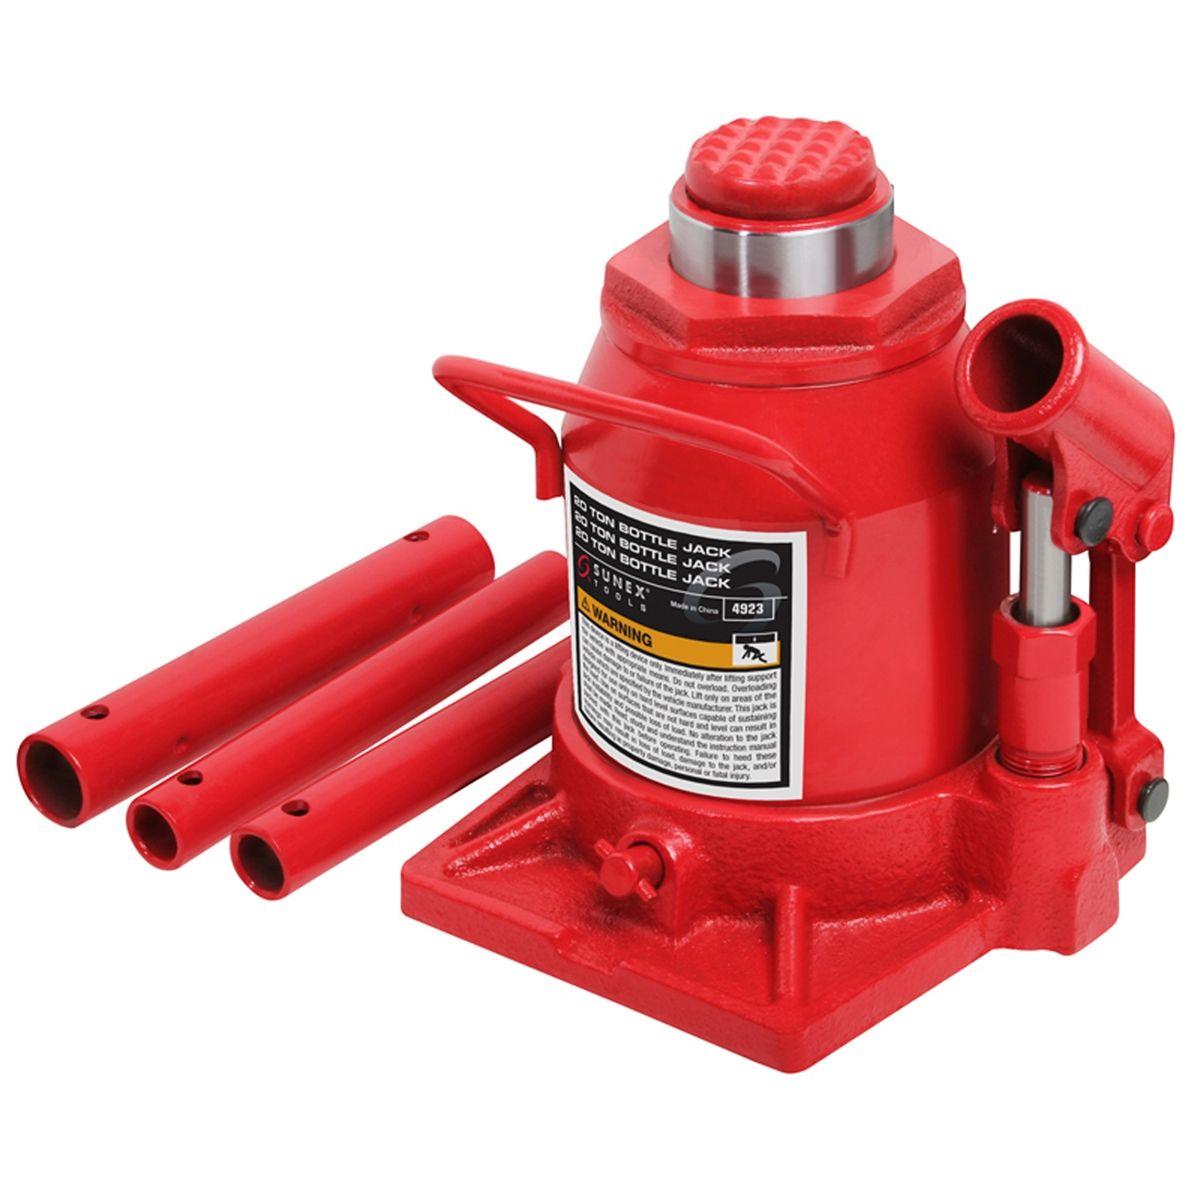 Short Hydraulic Jacks : Bottle jack short ton sunex international a